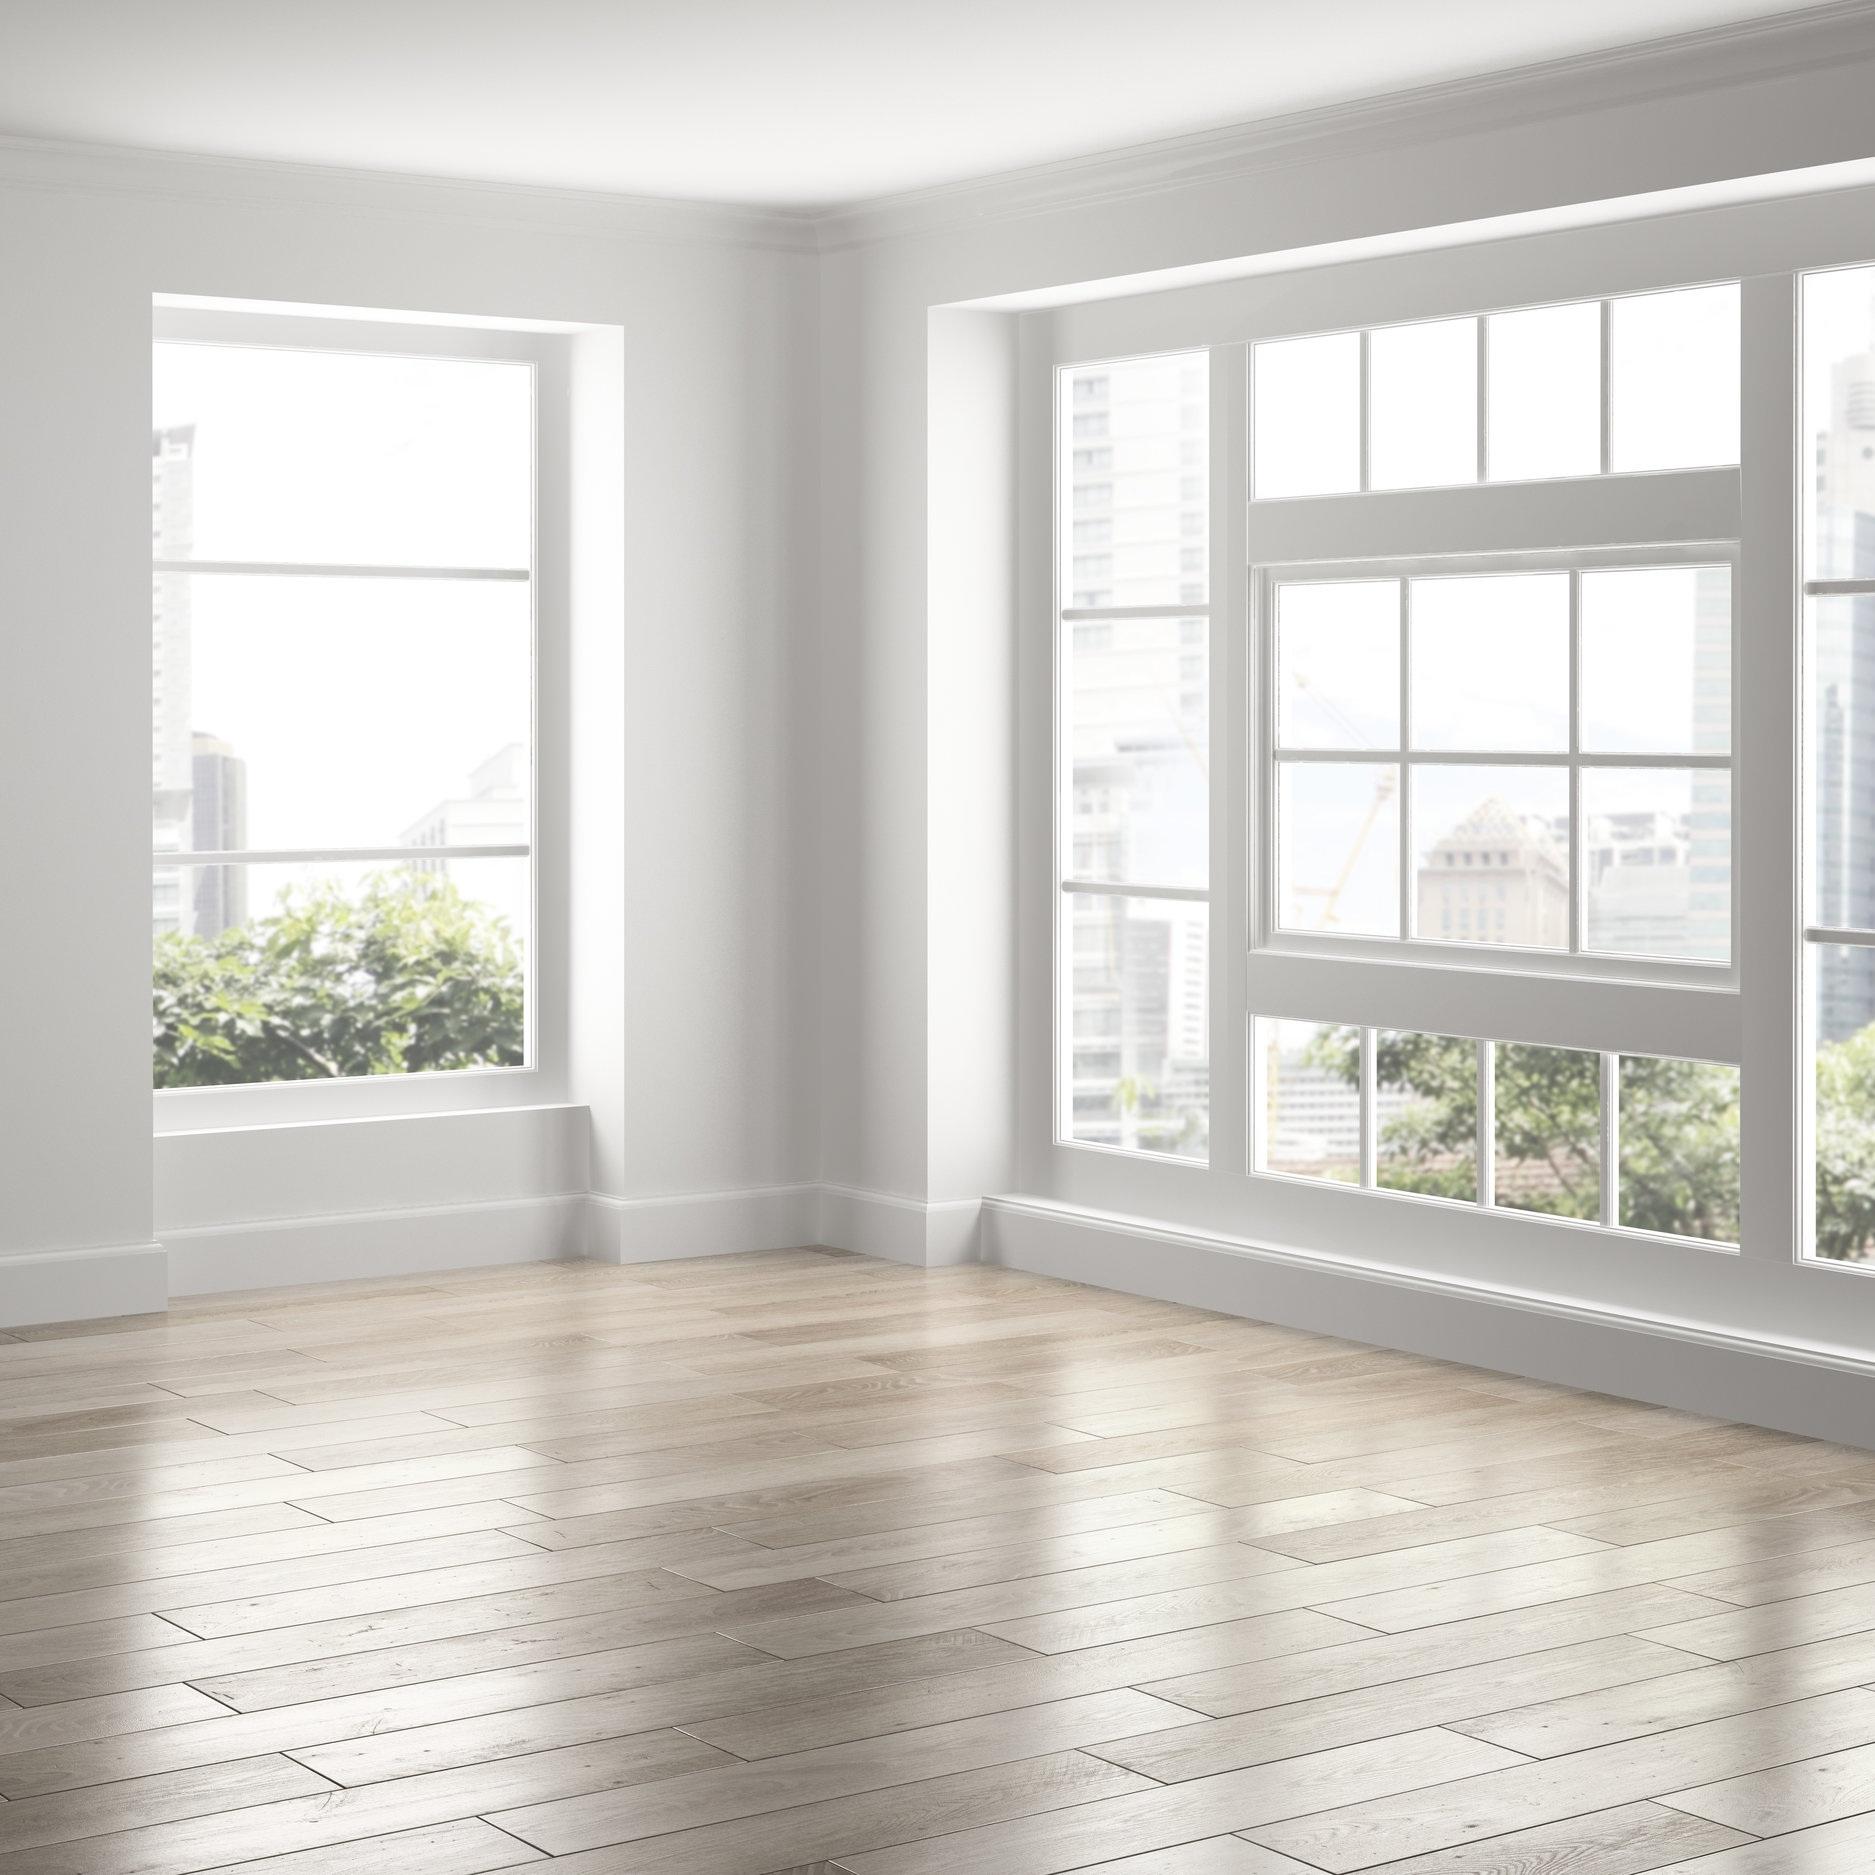 interior-empty-room-3d-rendering-P2DZRJ6.jpg